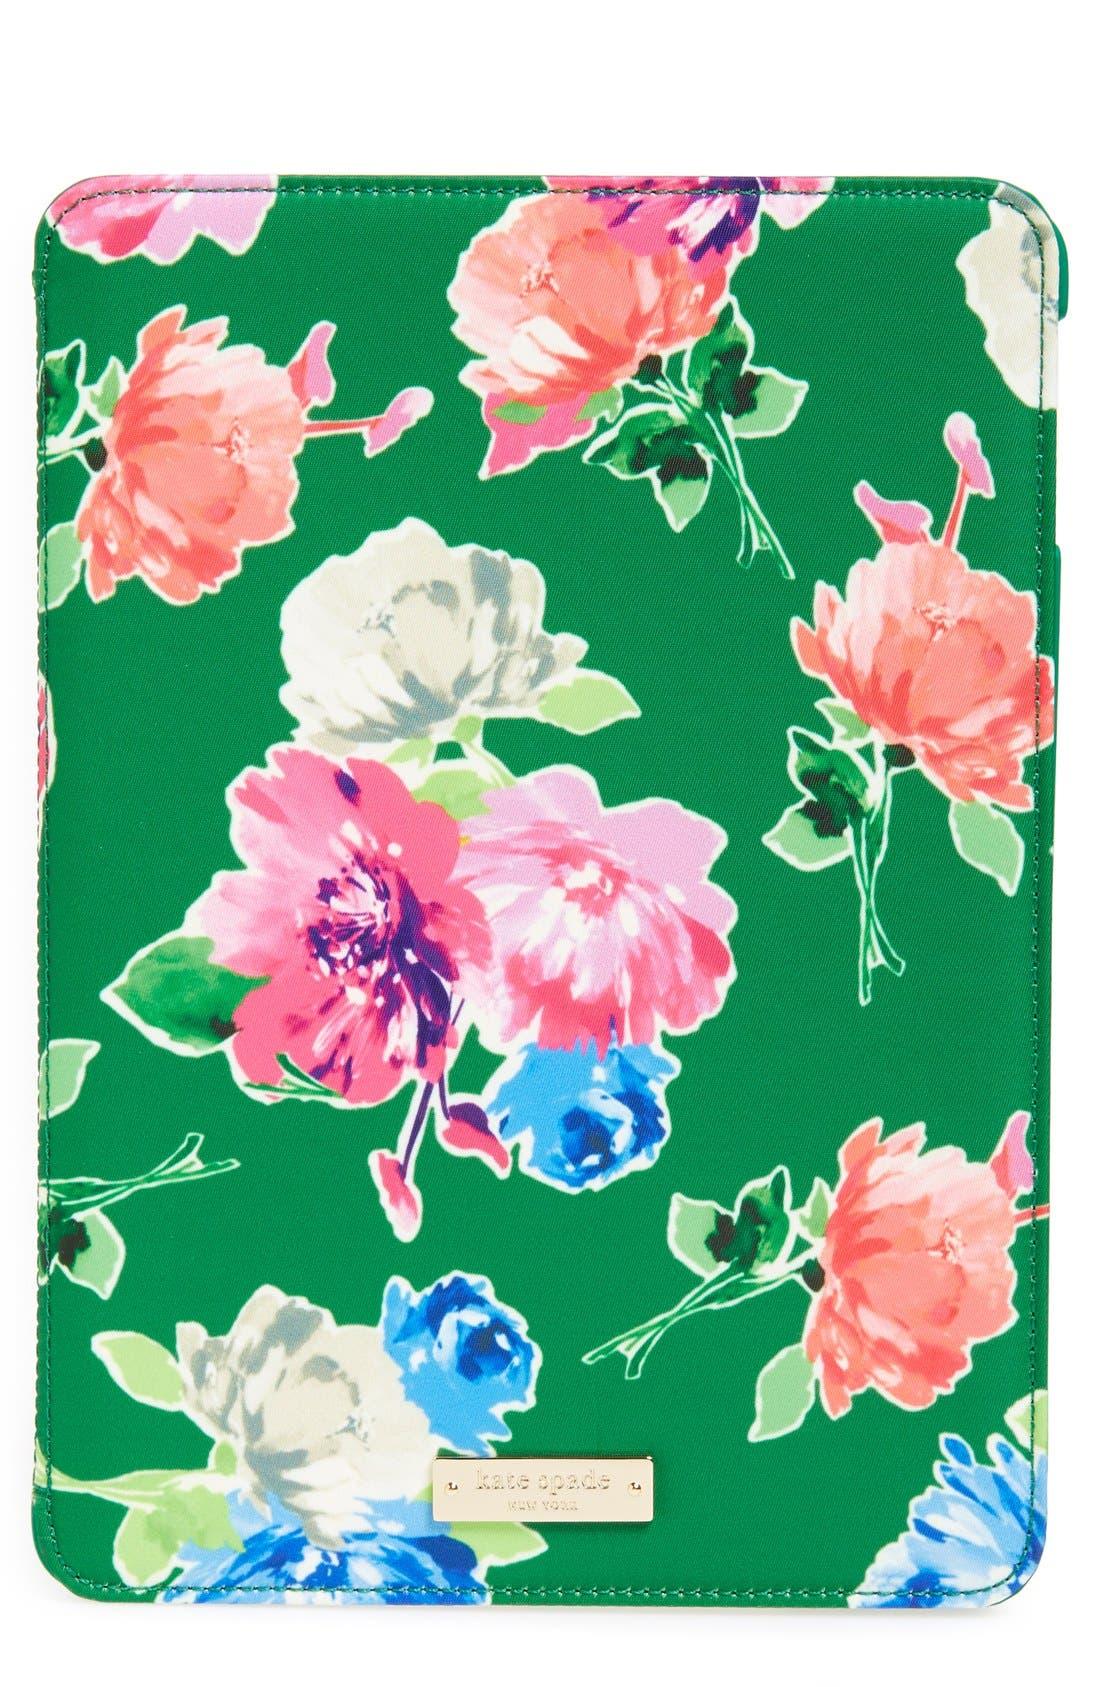 Main Image - kate spade new york 'spring blooms' iPad Air hardcase folio